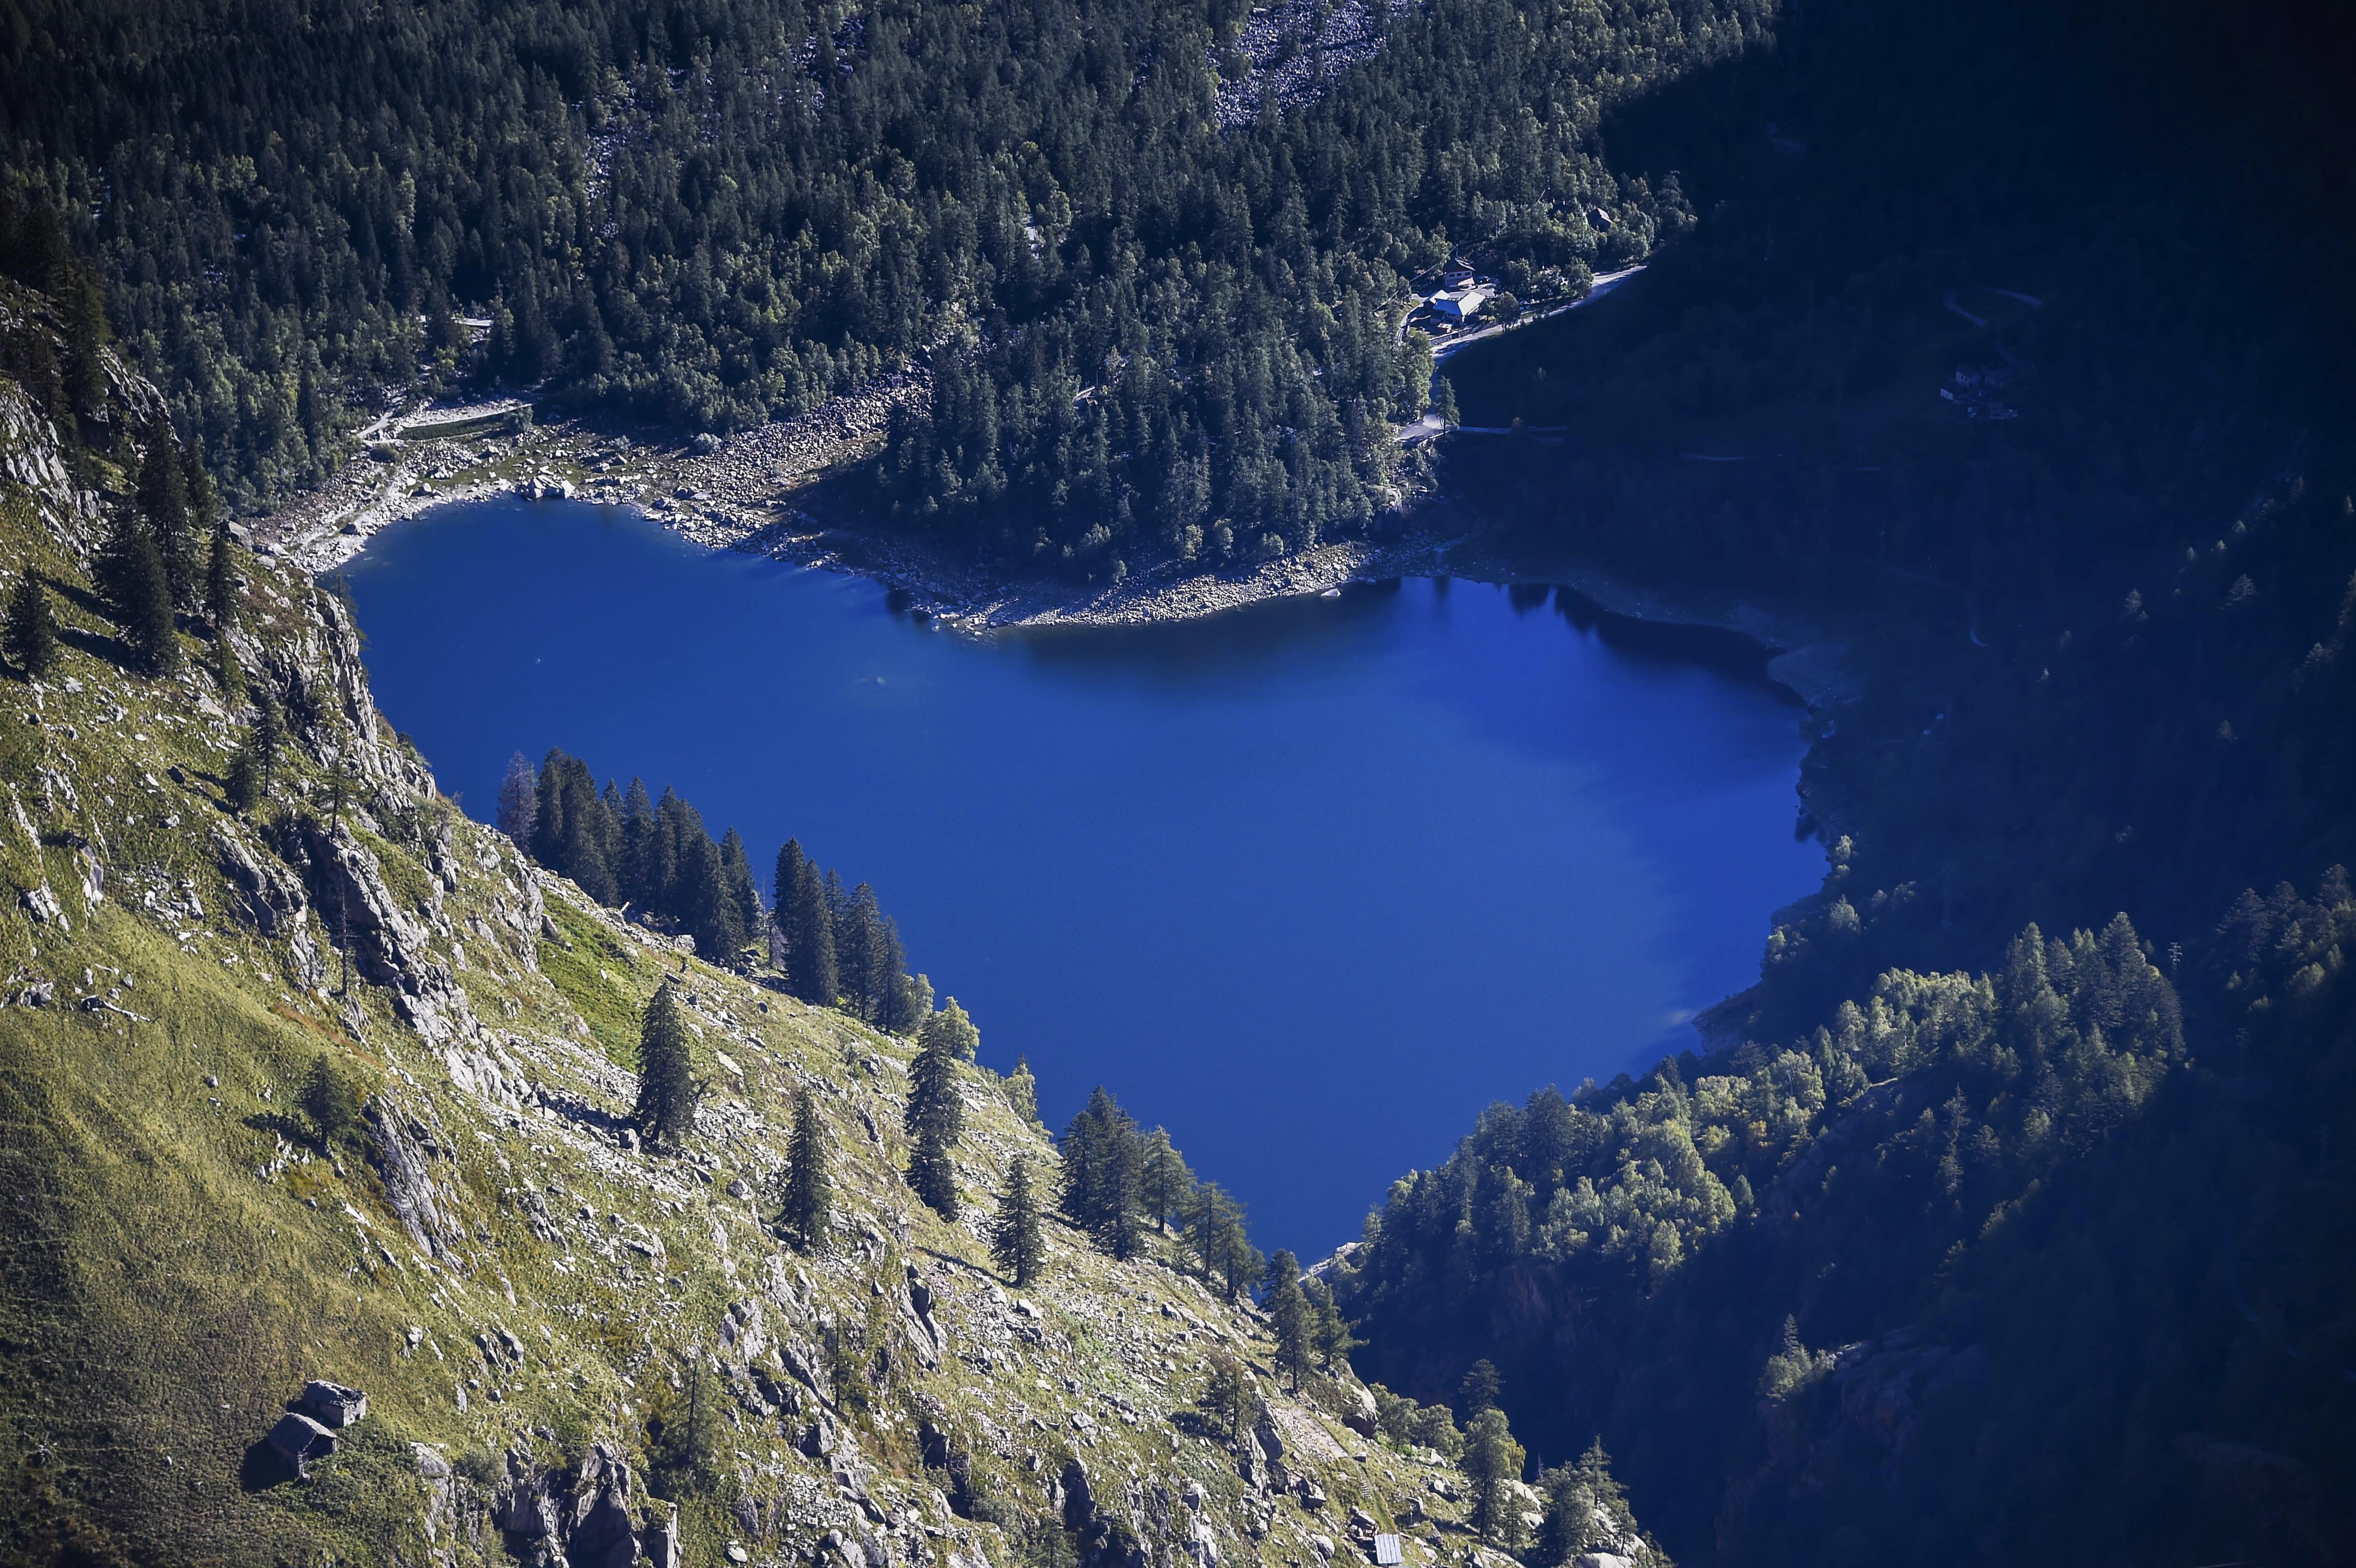 Antrona lake, Italy, 2015